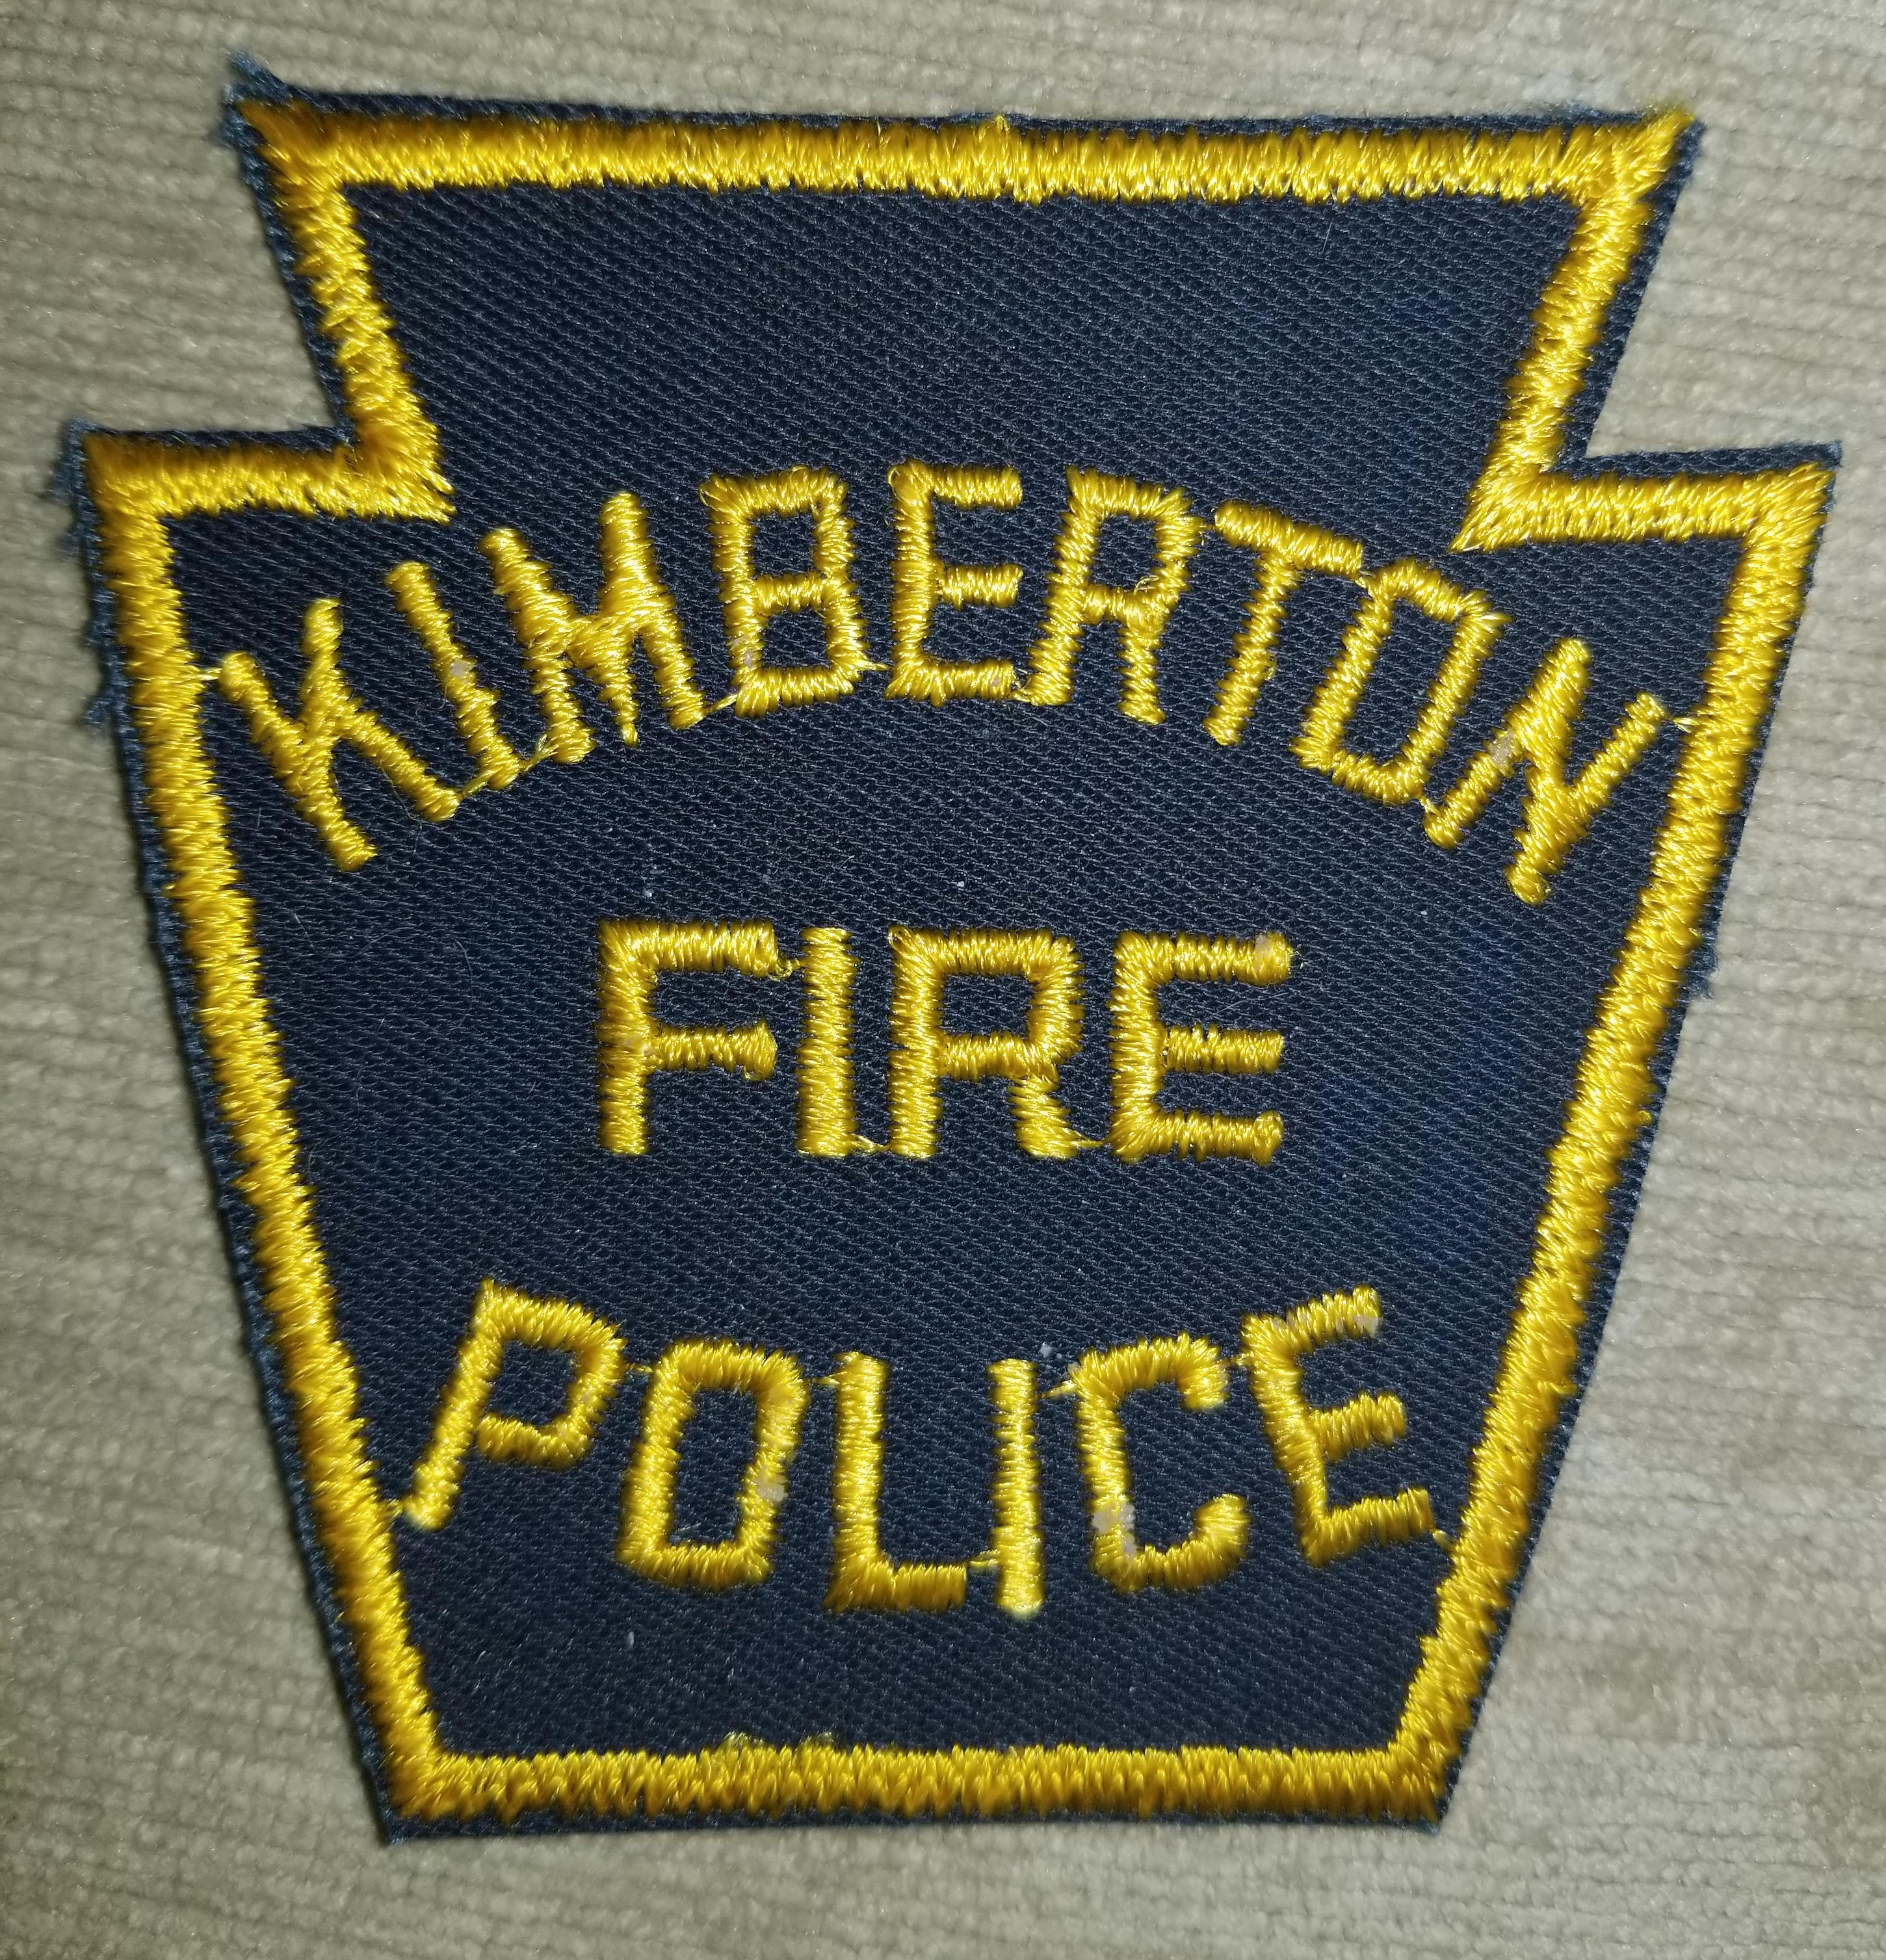 Kimberton Fire Police PA